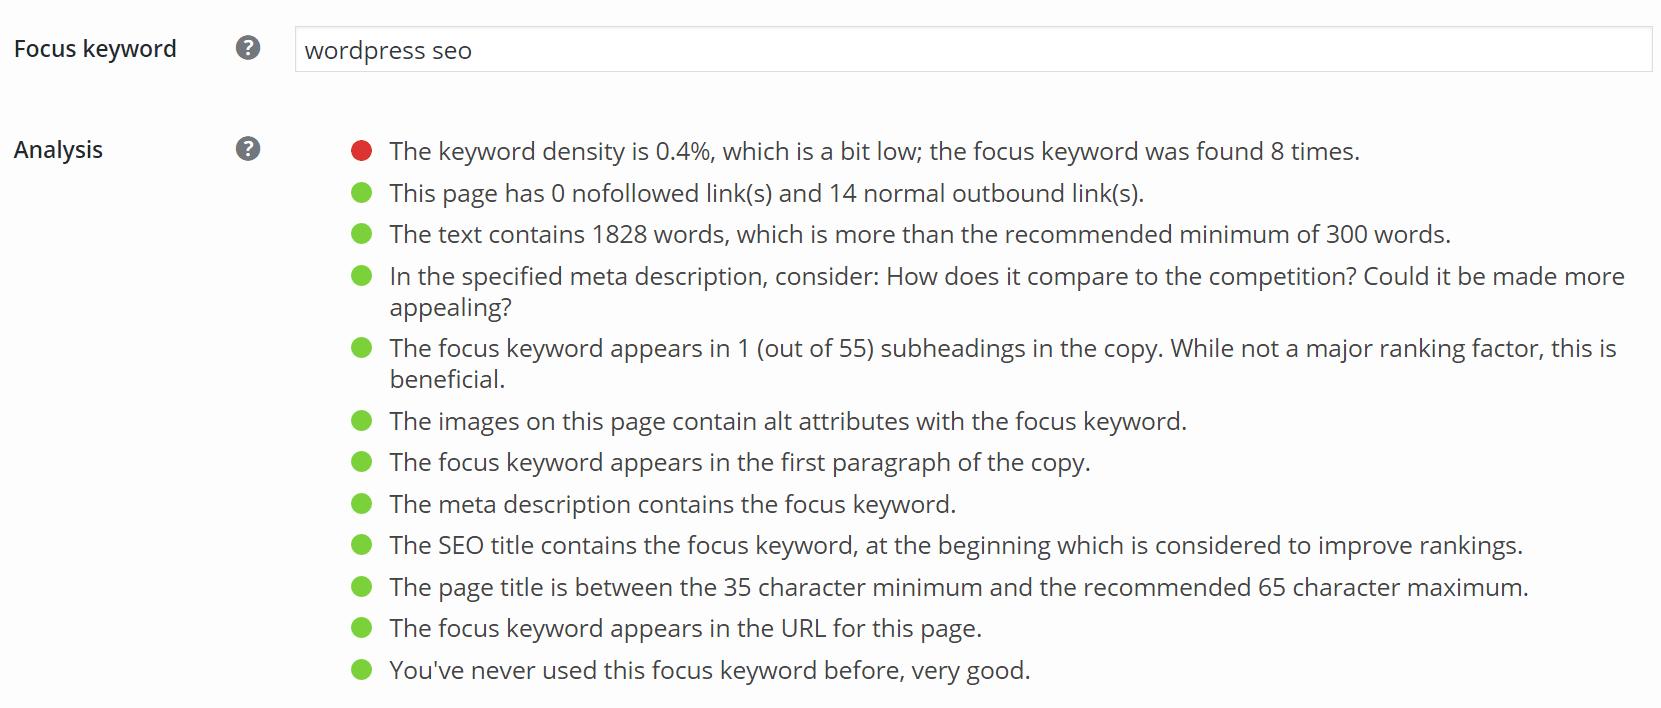 Palavra-chave de foco WordPress SEO